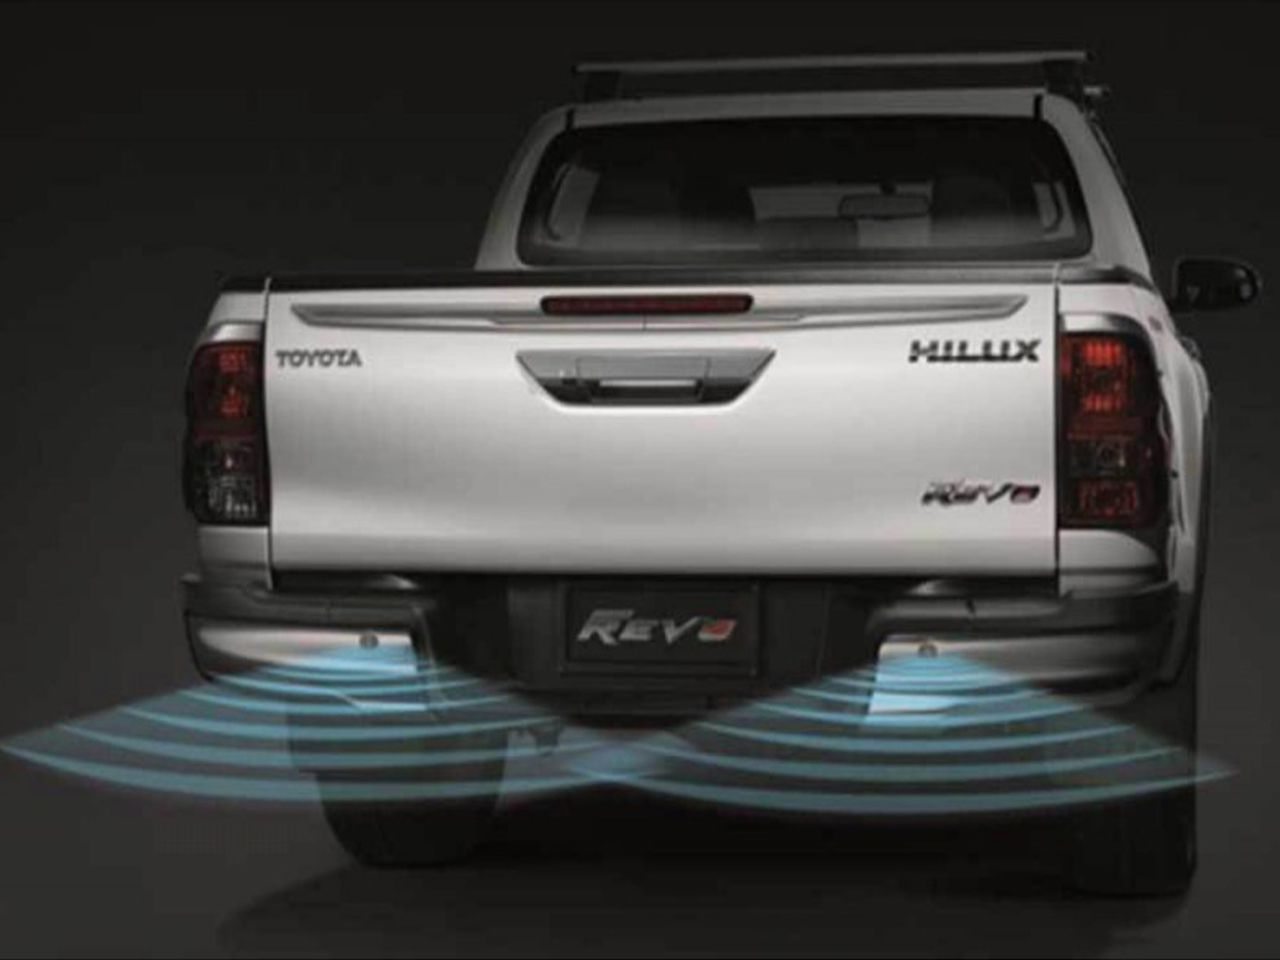 Sensor de Estacionamento Cromado Genuíno Hilux STD SR SRV SRX Chassi Cabine Simples  - Mirai Peças Toyota